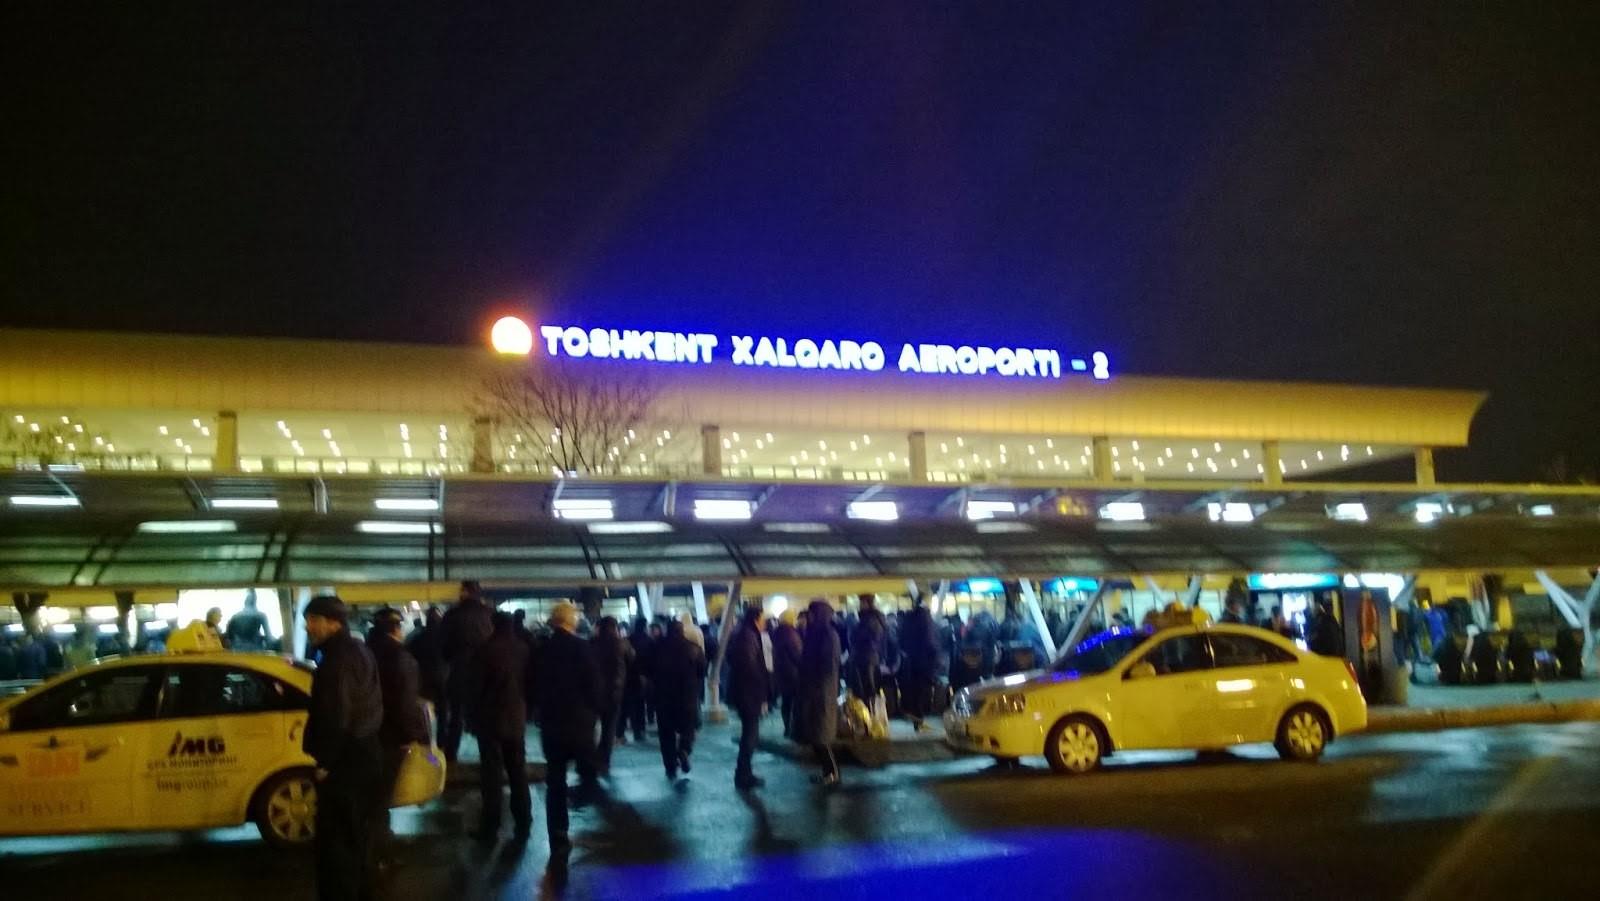 Тошкент аэропорти. Токайгача?